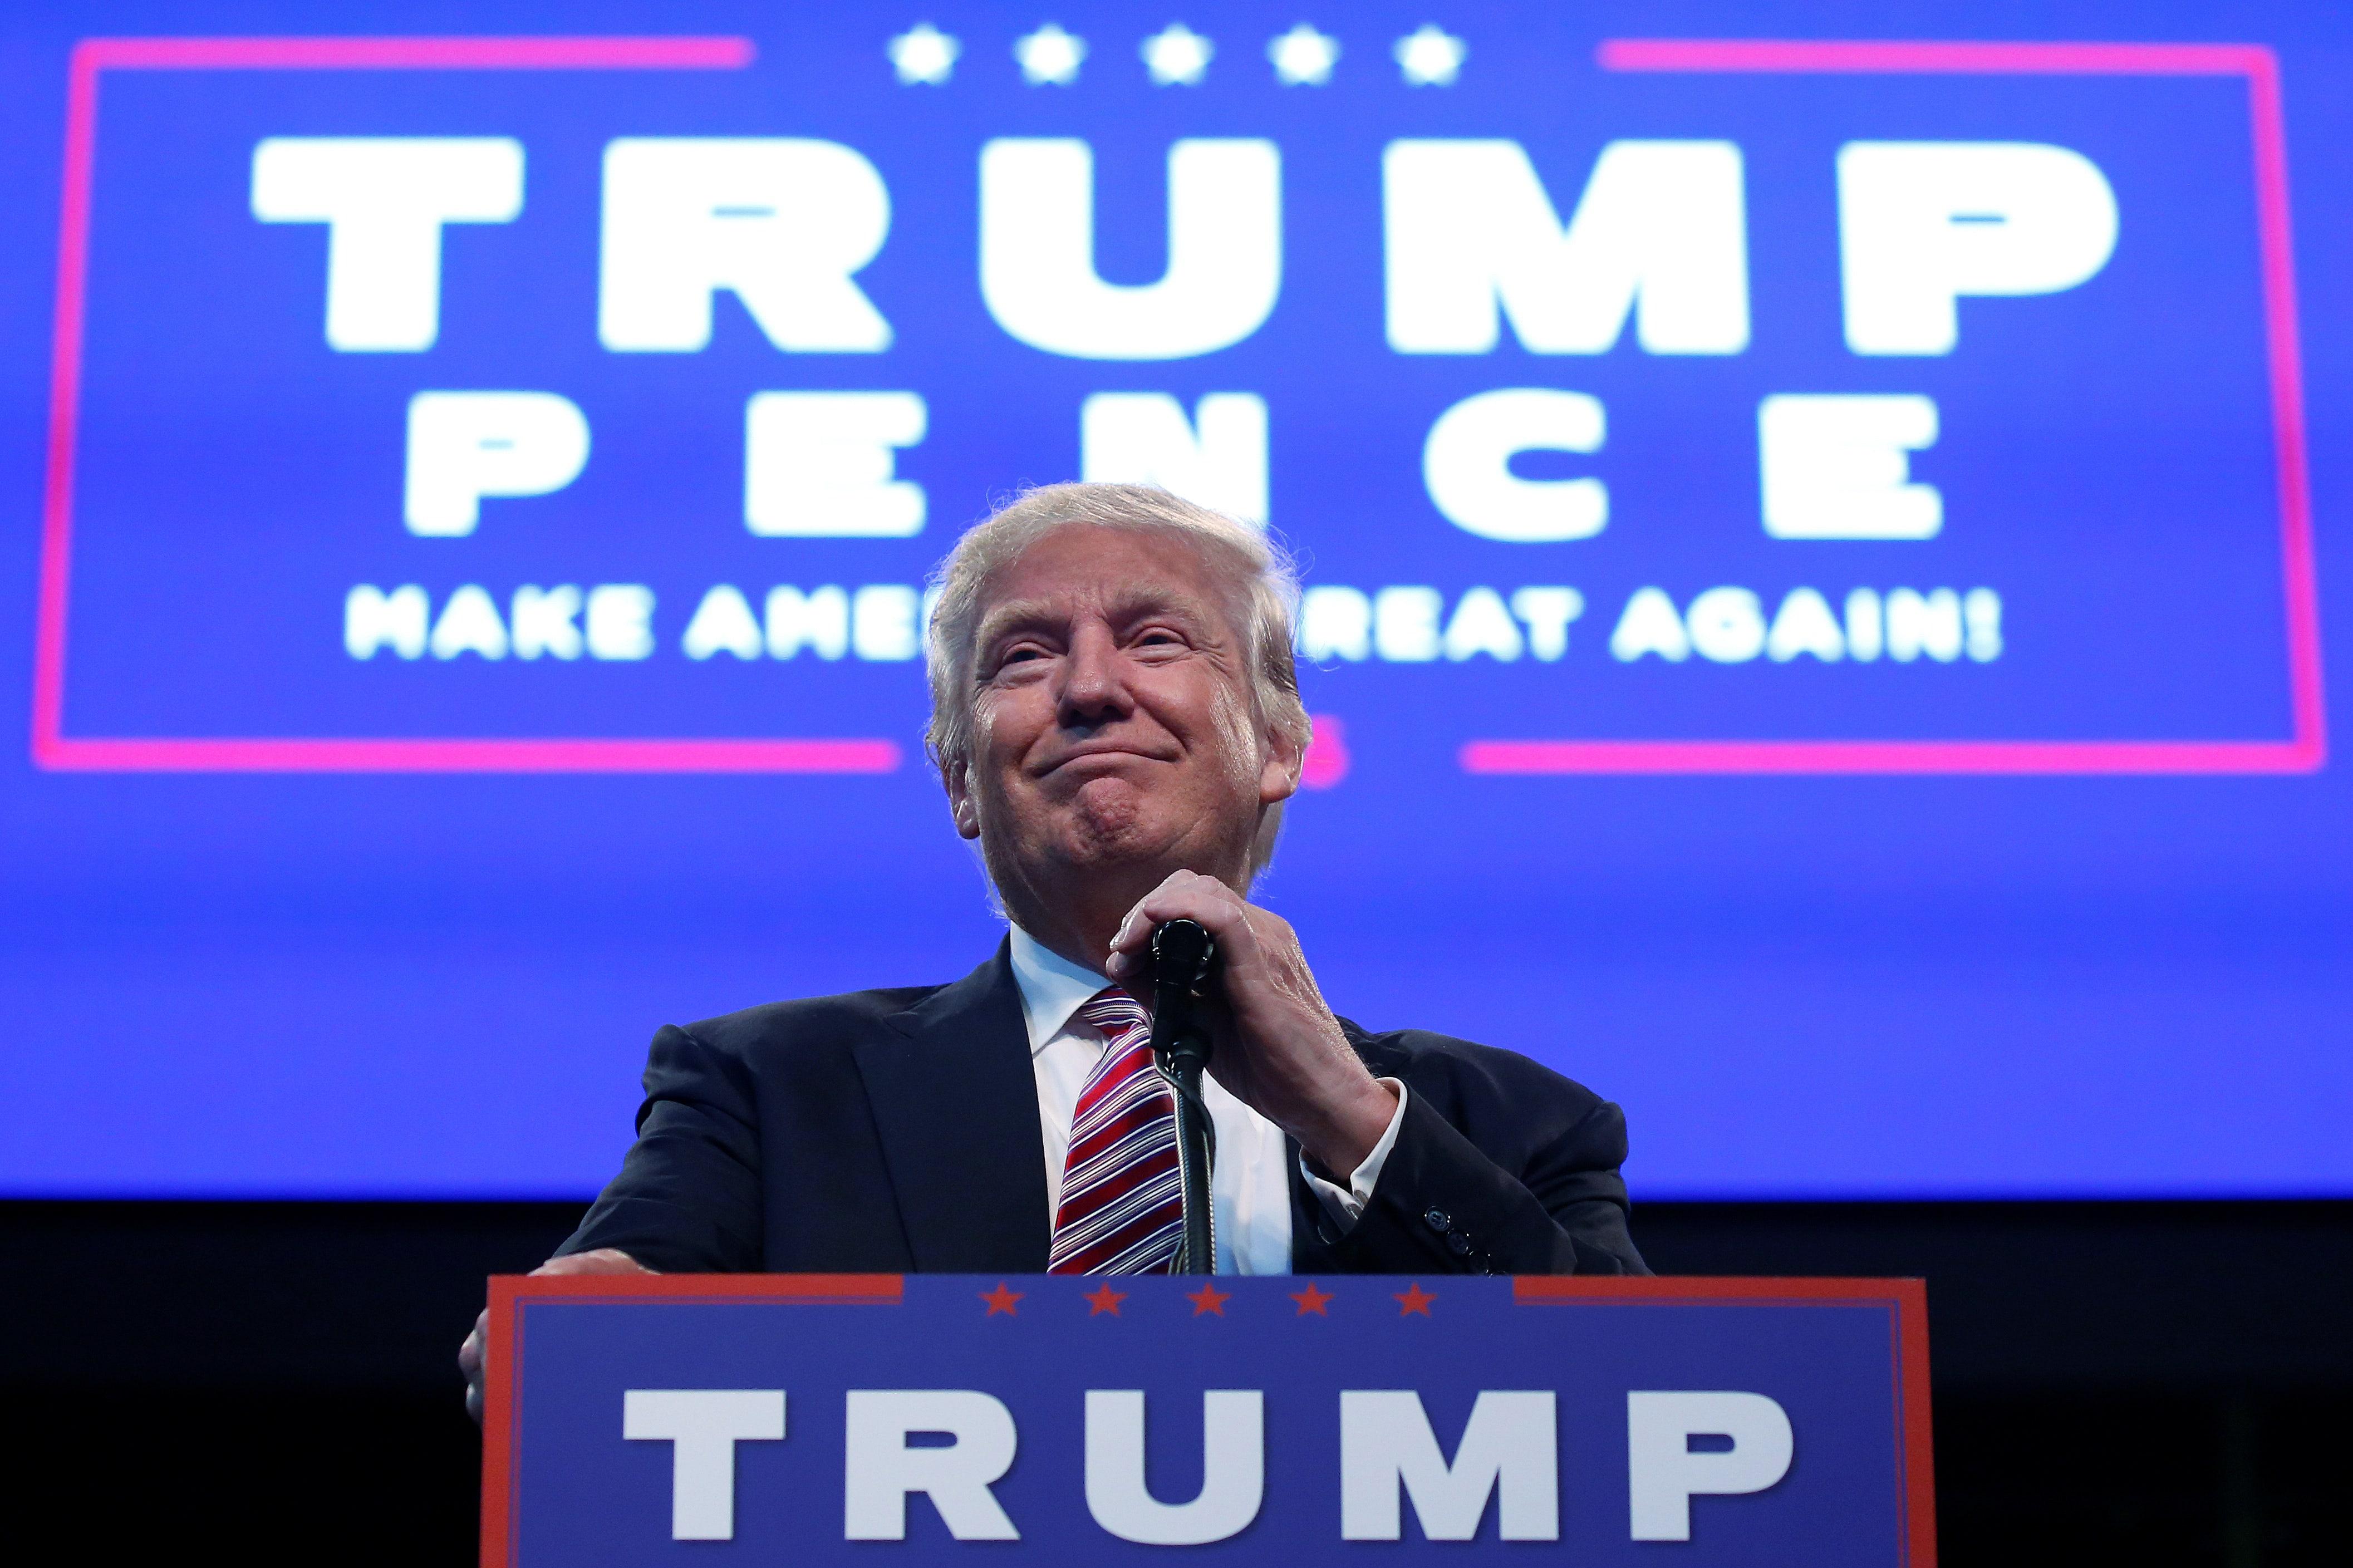 Trump vs. Clinton battle goes digital